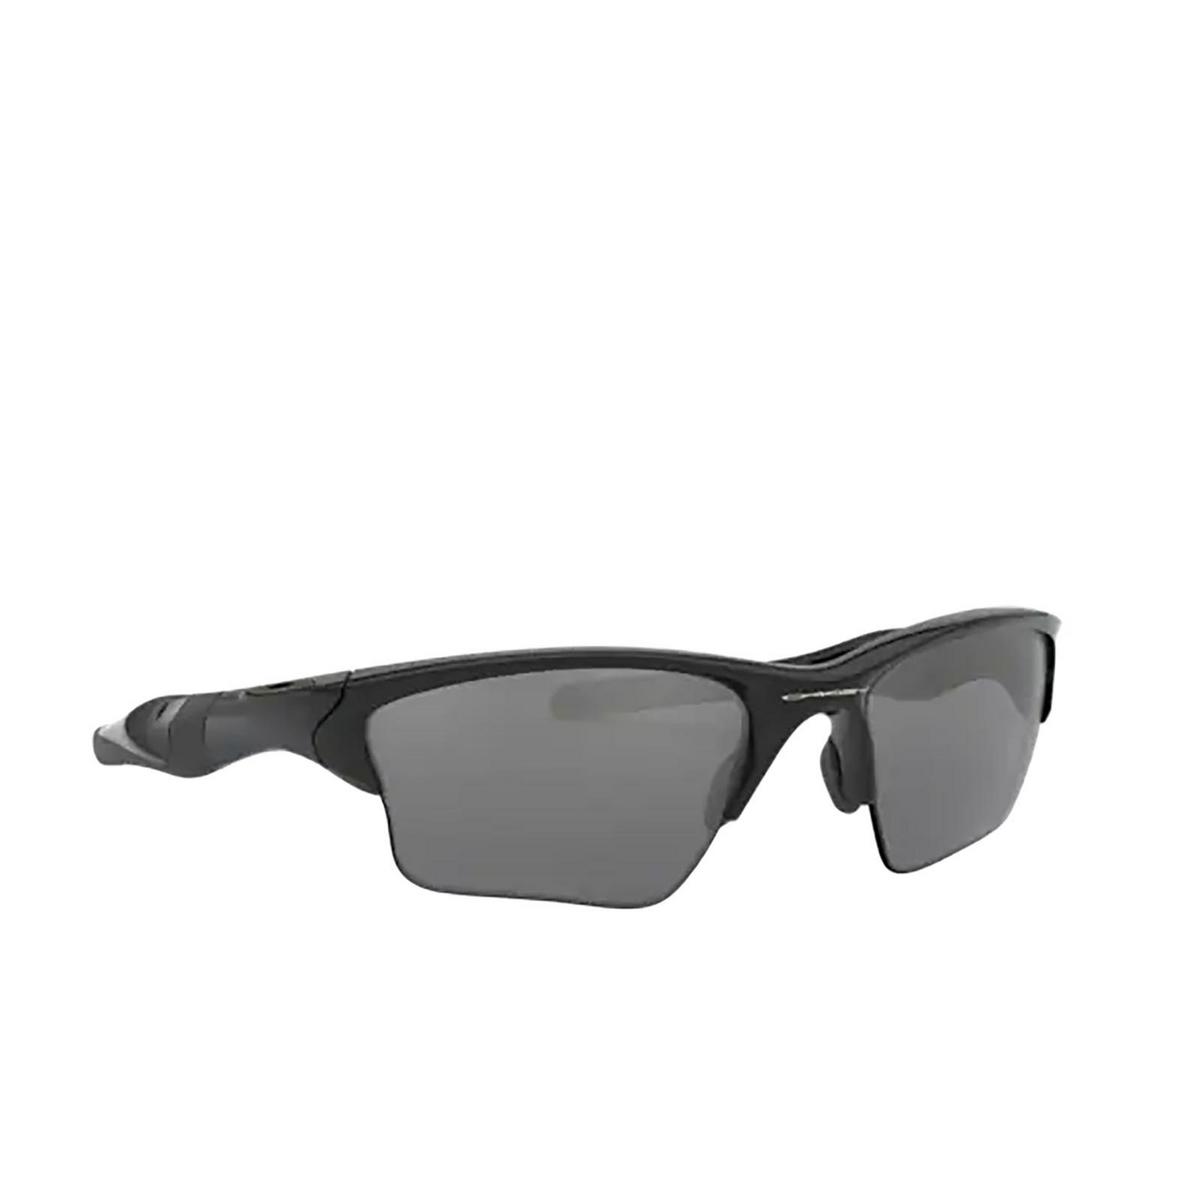 Oakley® Irregular Sunglasses: Half Jacket 2.0 Xl OO9154 color Polished Black 915405 - 3/3.